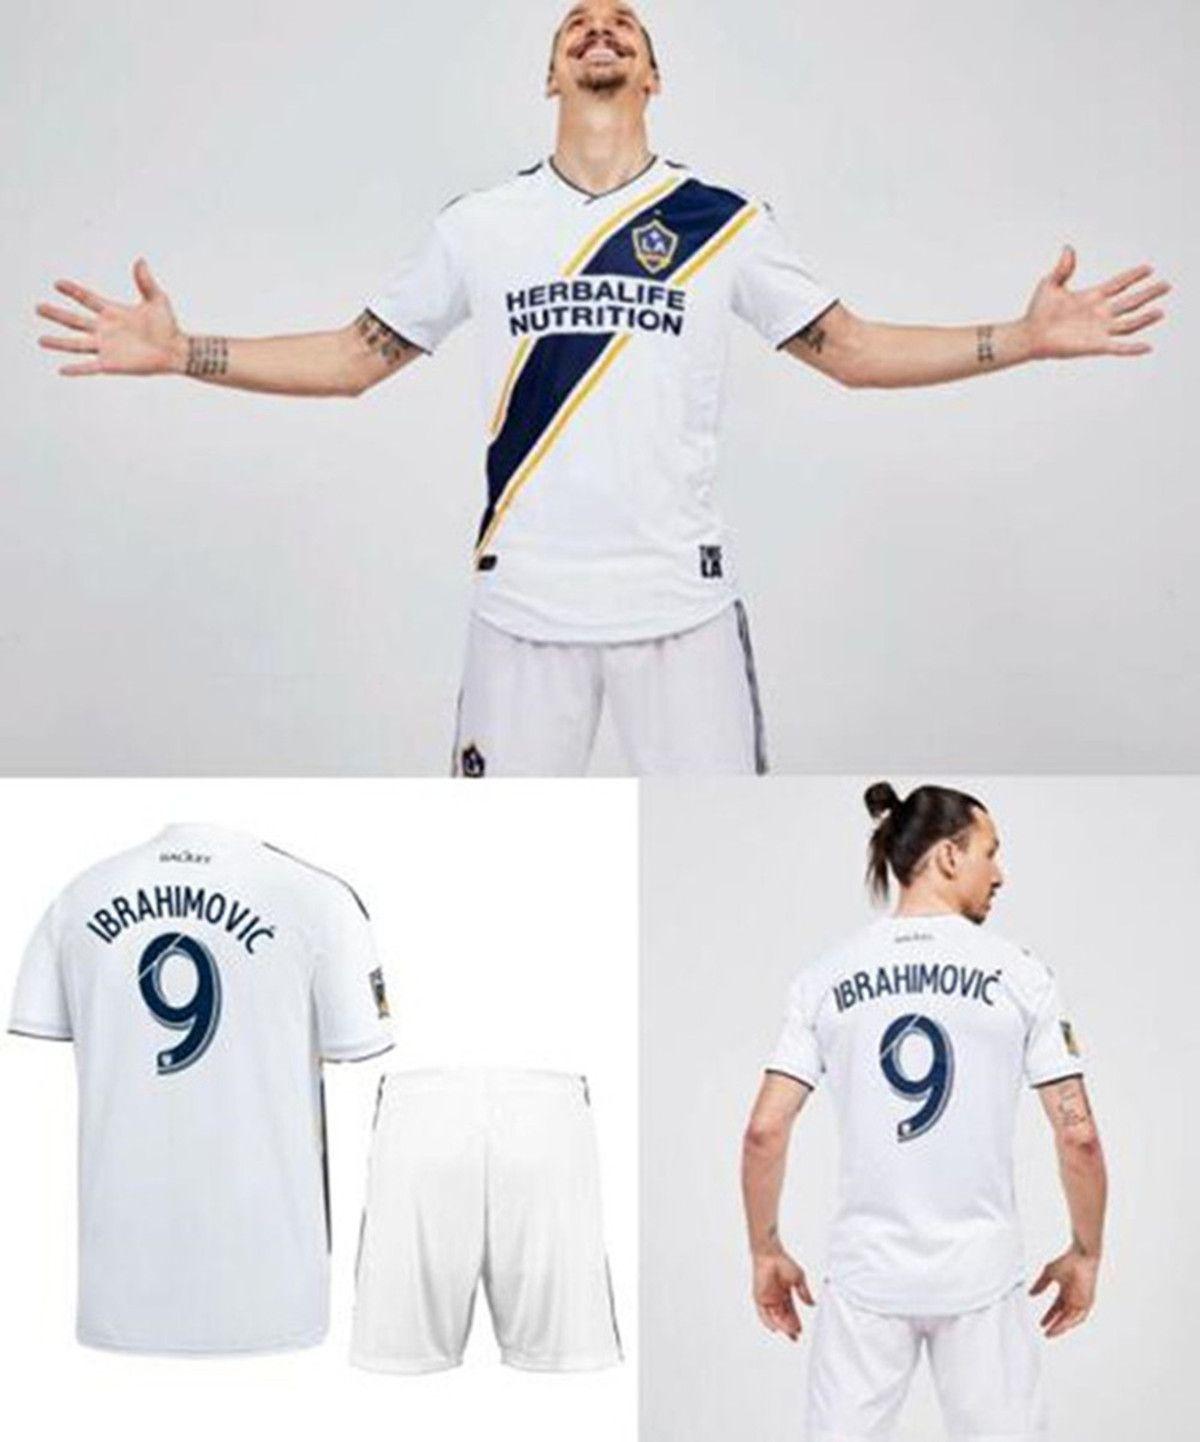 2018 2018 Ibrahimovic La Galaxy Soccer Jersey 18 19 Ibrahimovic Los Angeles  Mls Camisetas De Futbol Football Jerseys Shirts Maillot De Foot From  Tengbin, ...